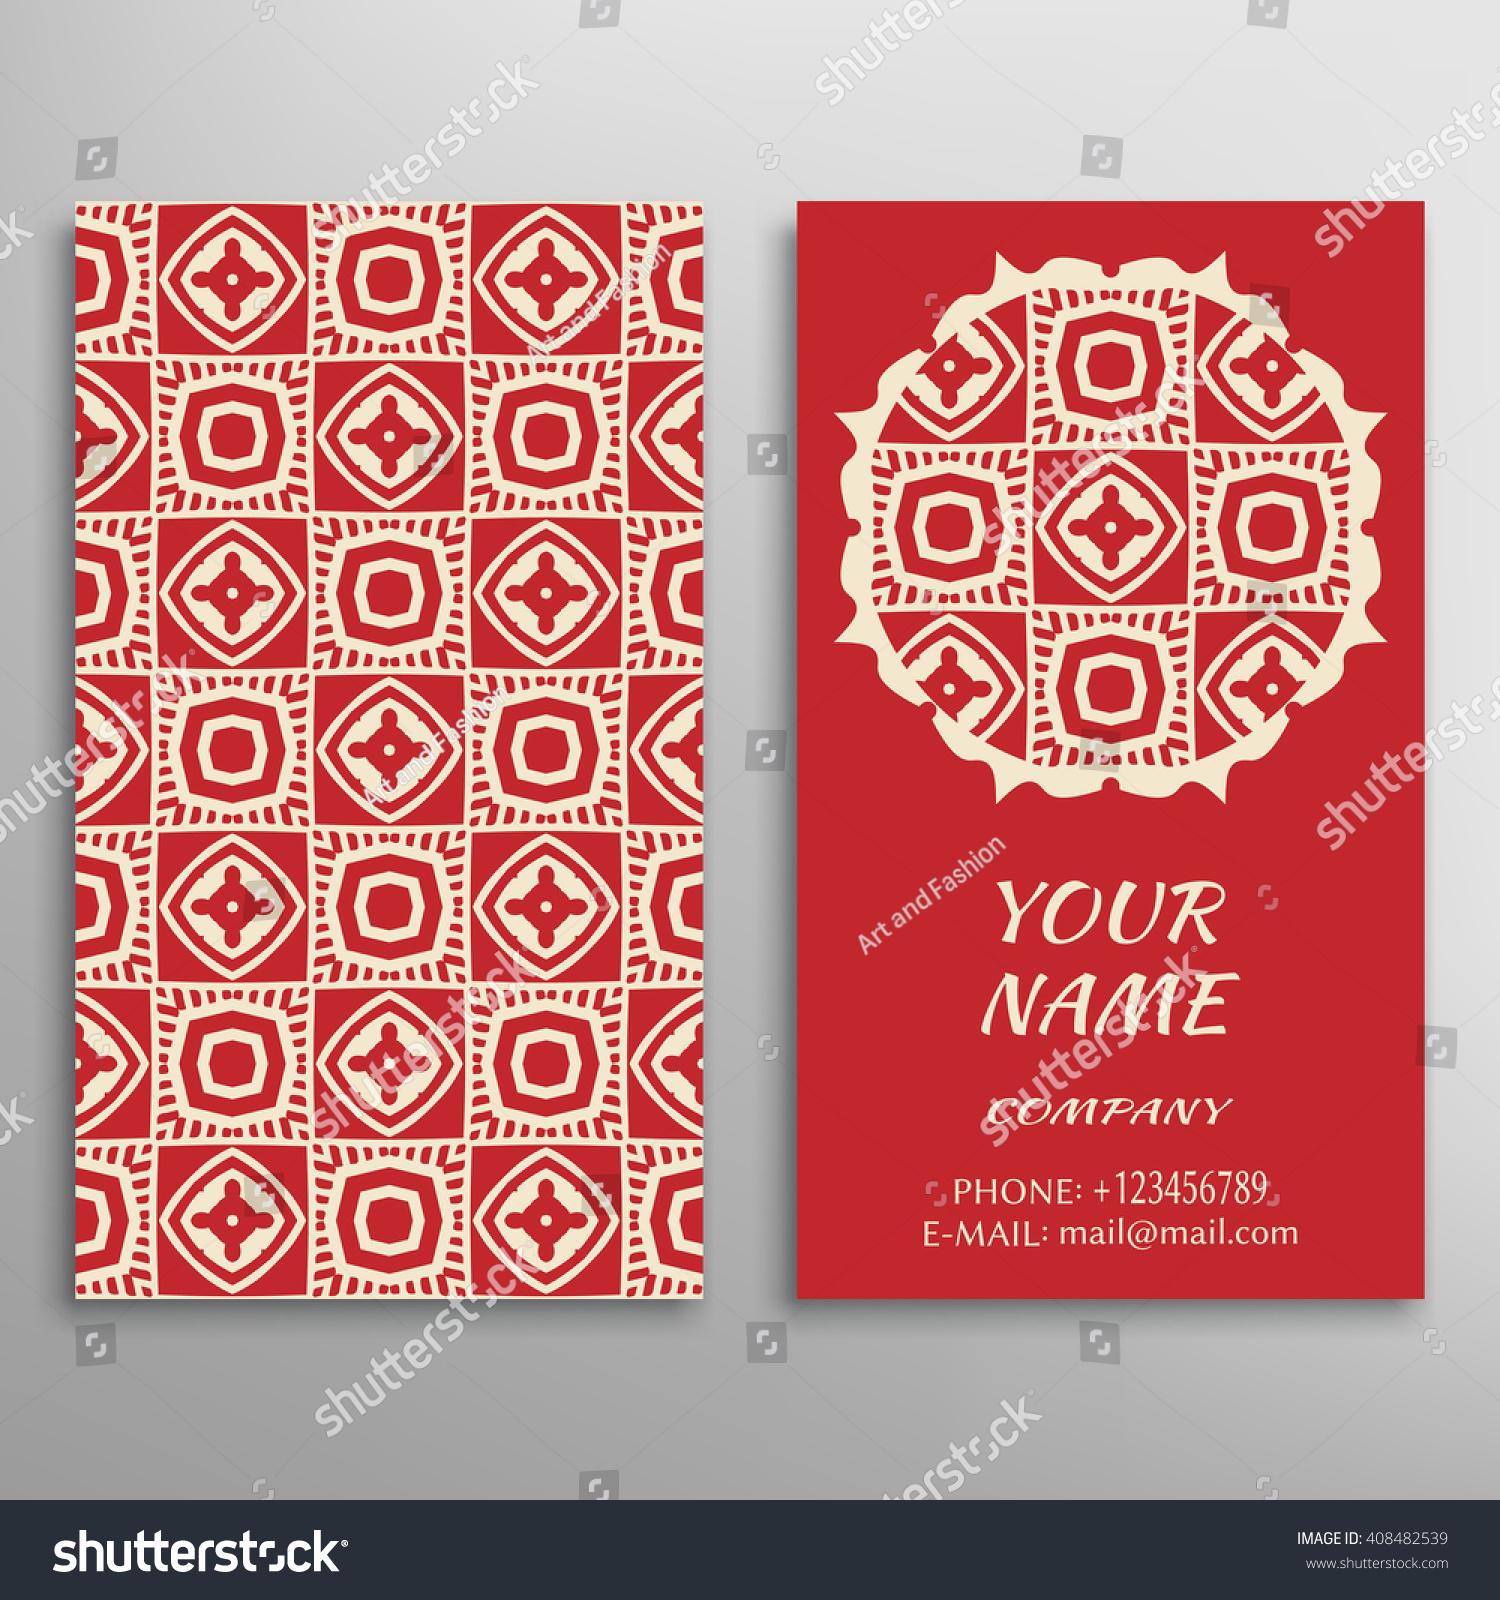 Business Card Geometric Floral Pattern Mandala Stock Vector ...